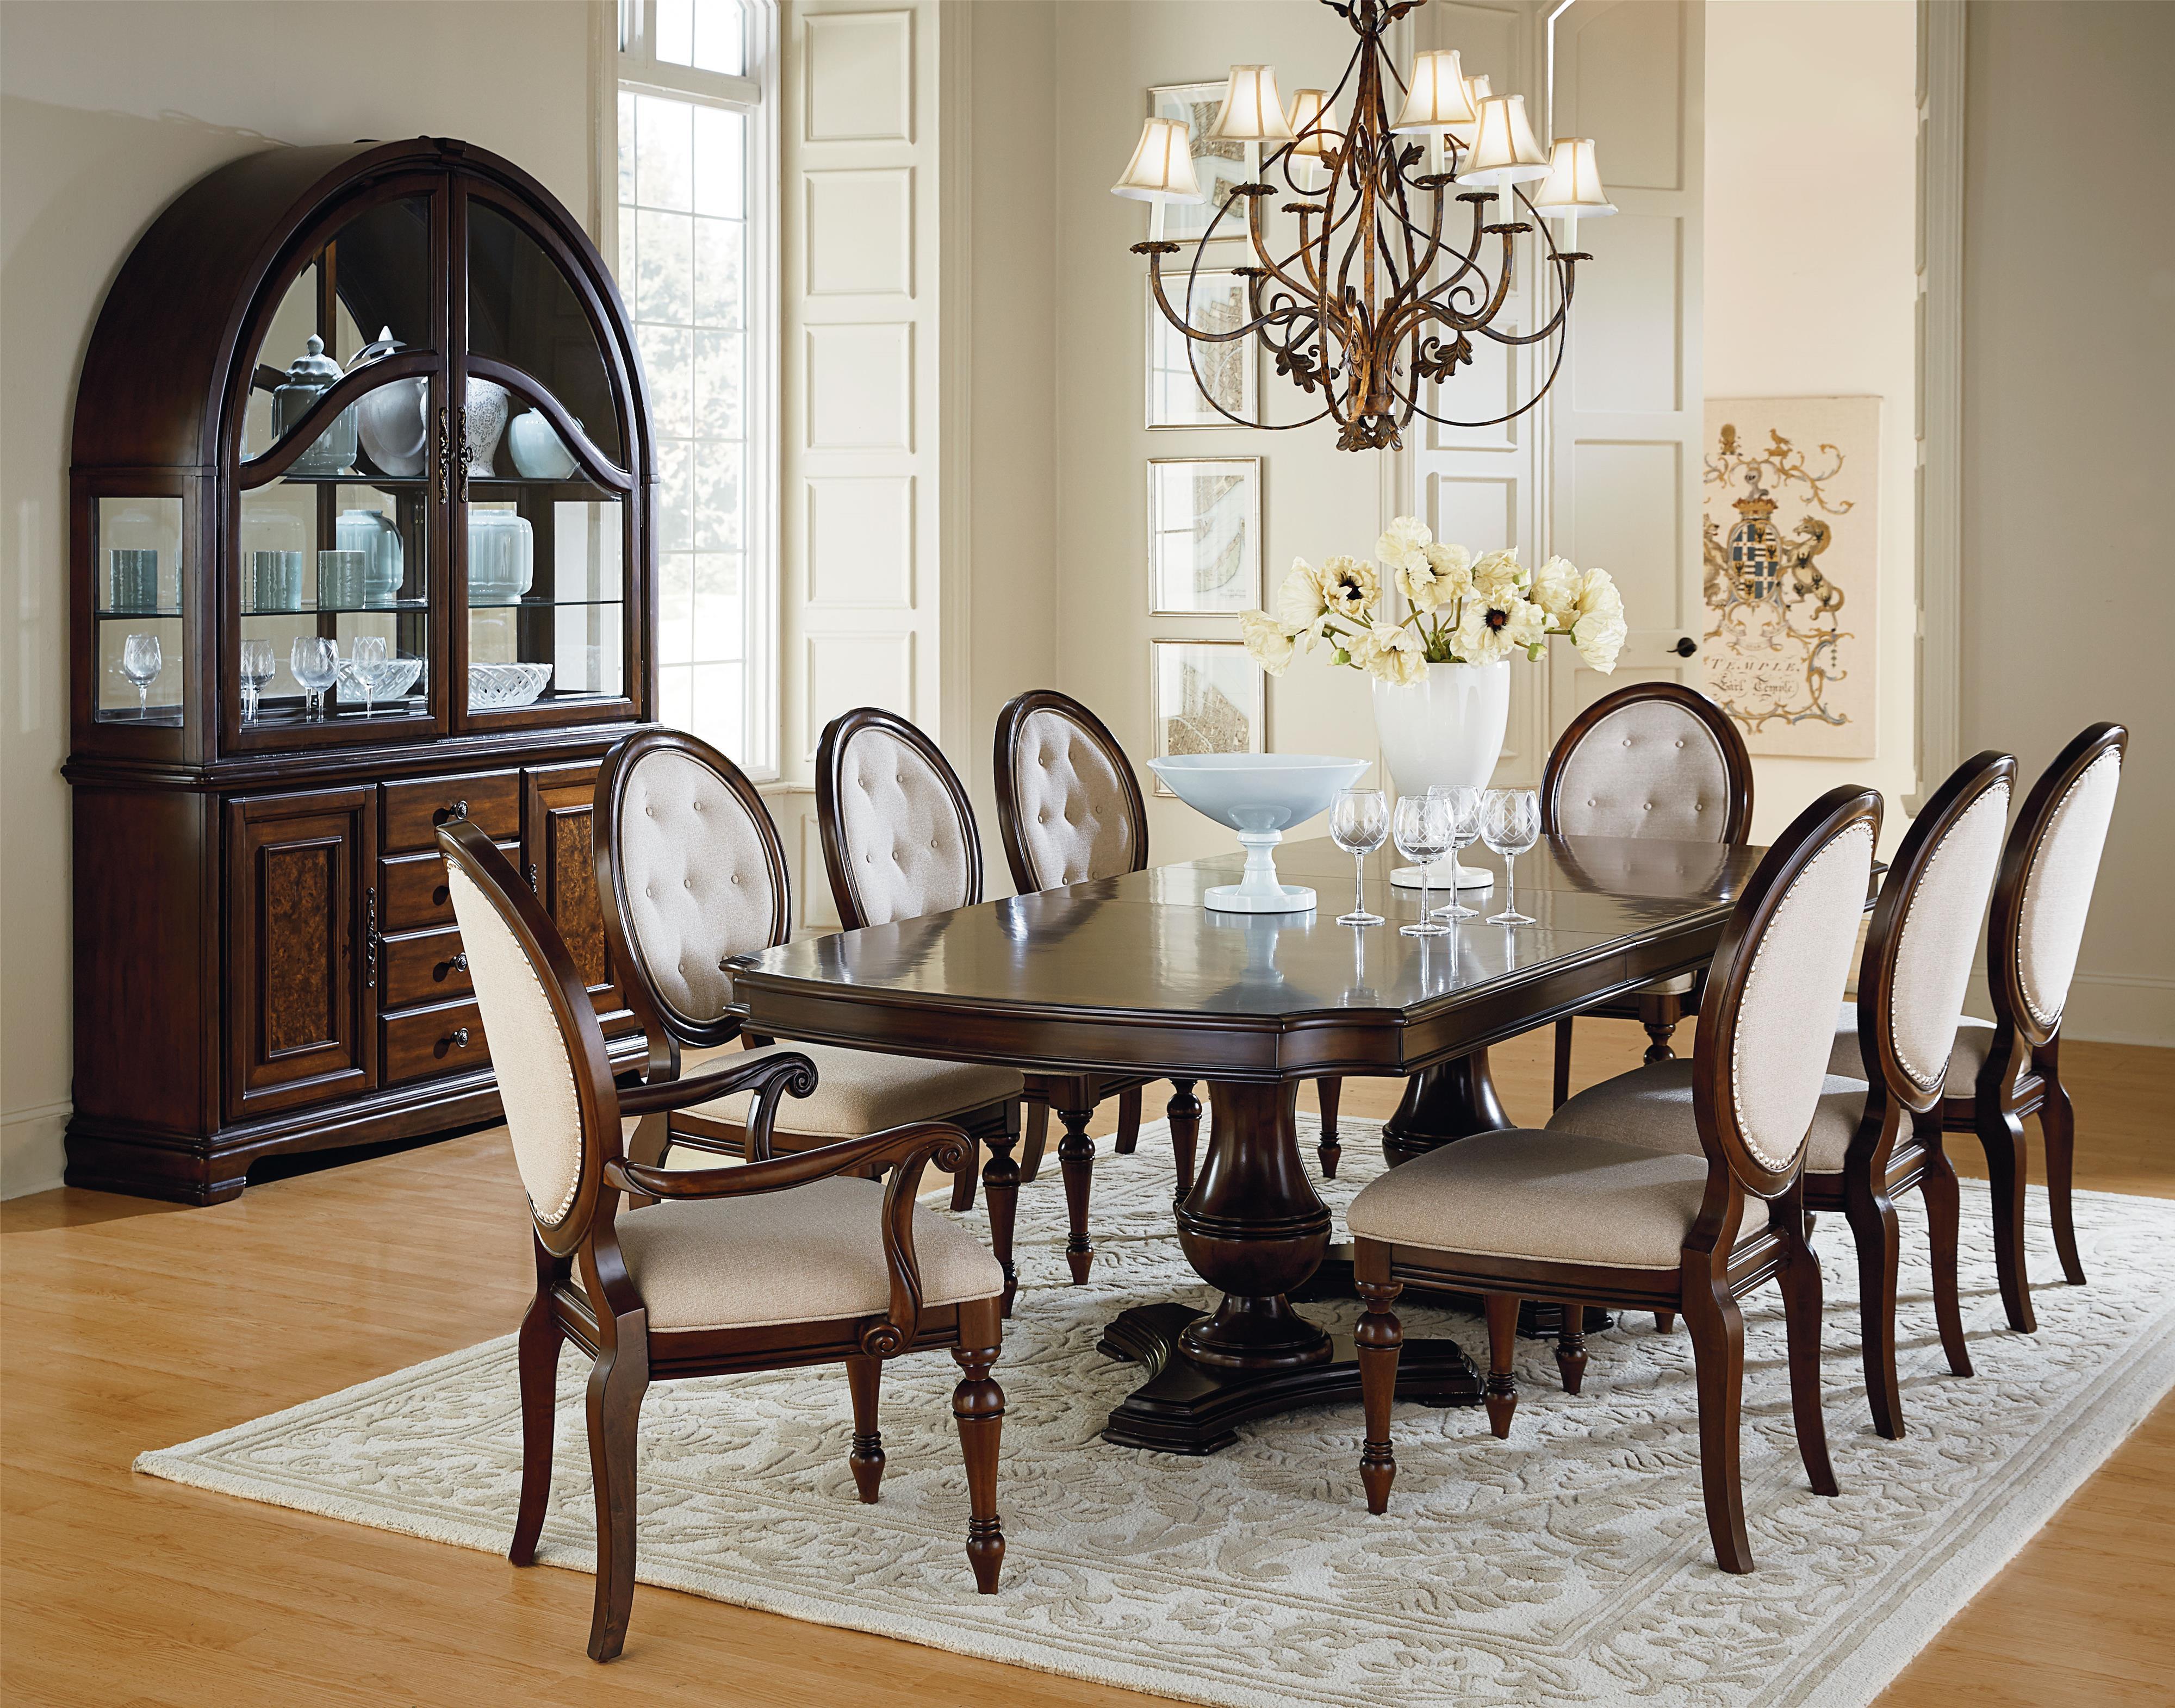 Standard Furniture Carrington Dining Dining Room Group - Item Number: 17020 Formal Dining Room Group 1